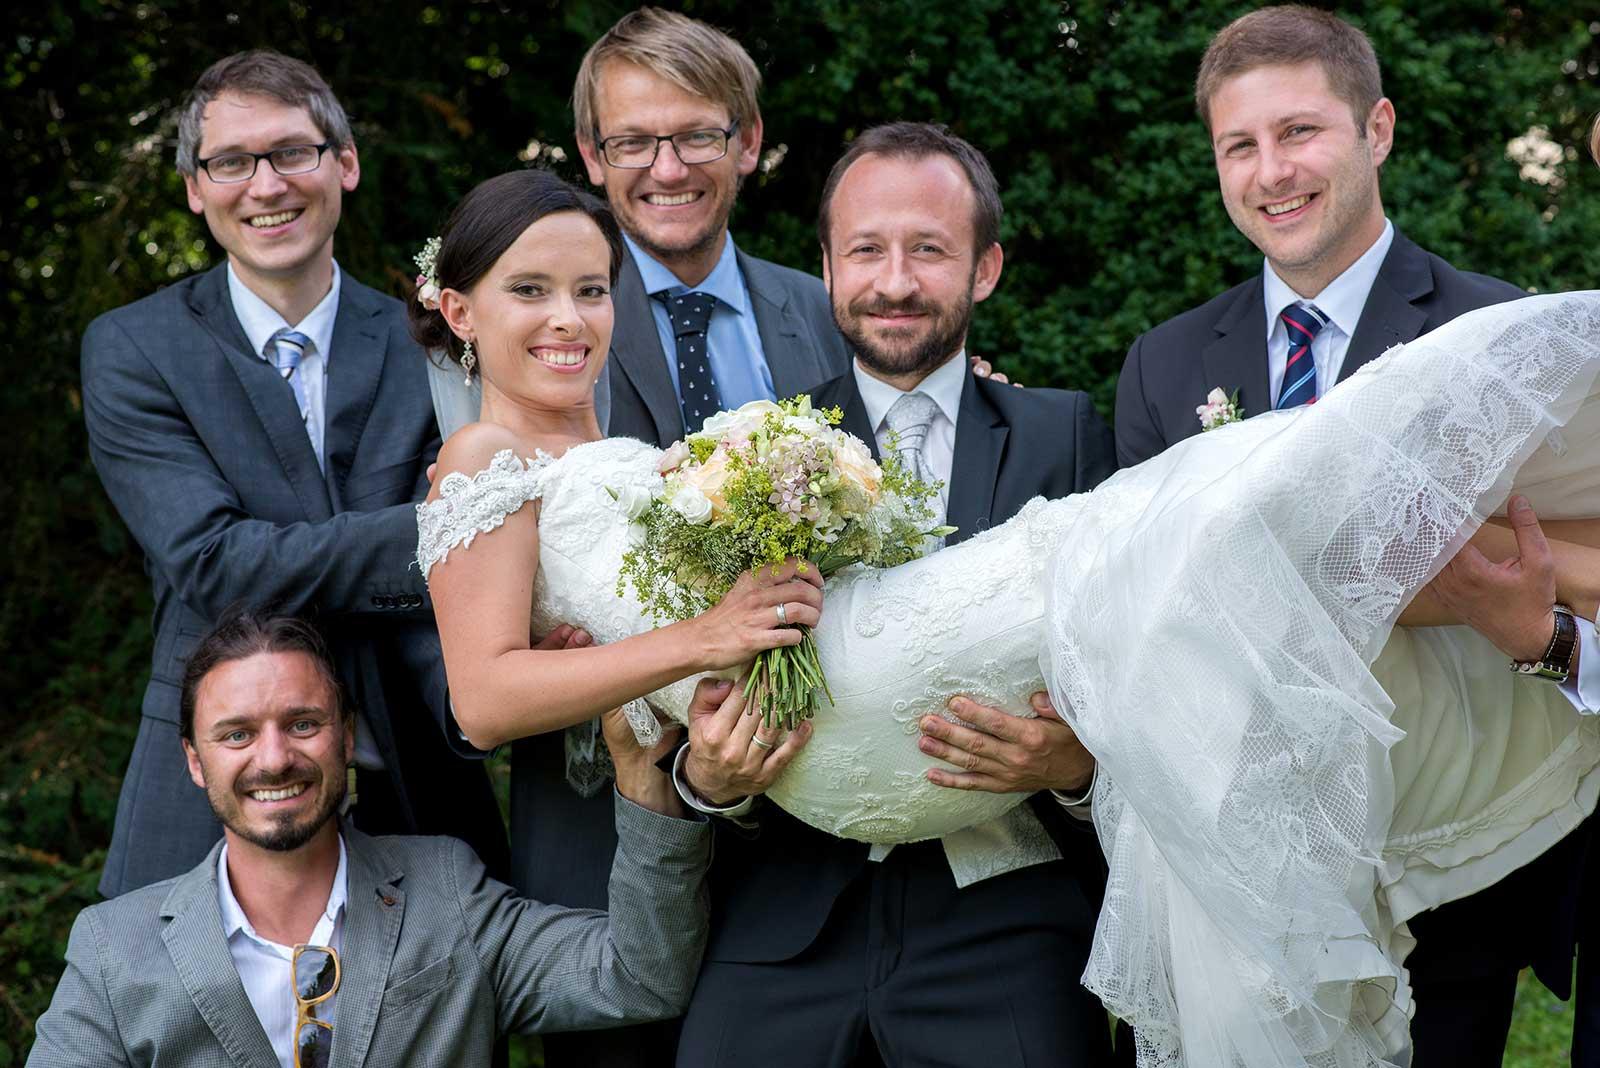 30 svatebni foto svatebcane a nevesta svatebni fotograf ales motejl jihocesky kraj